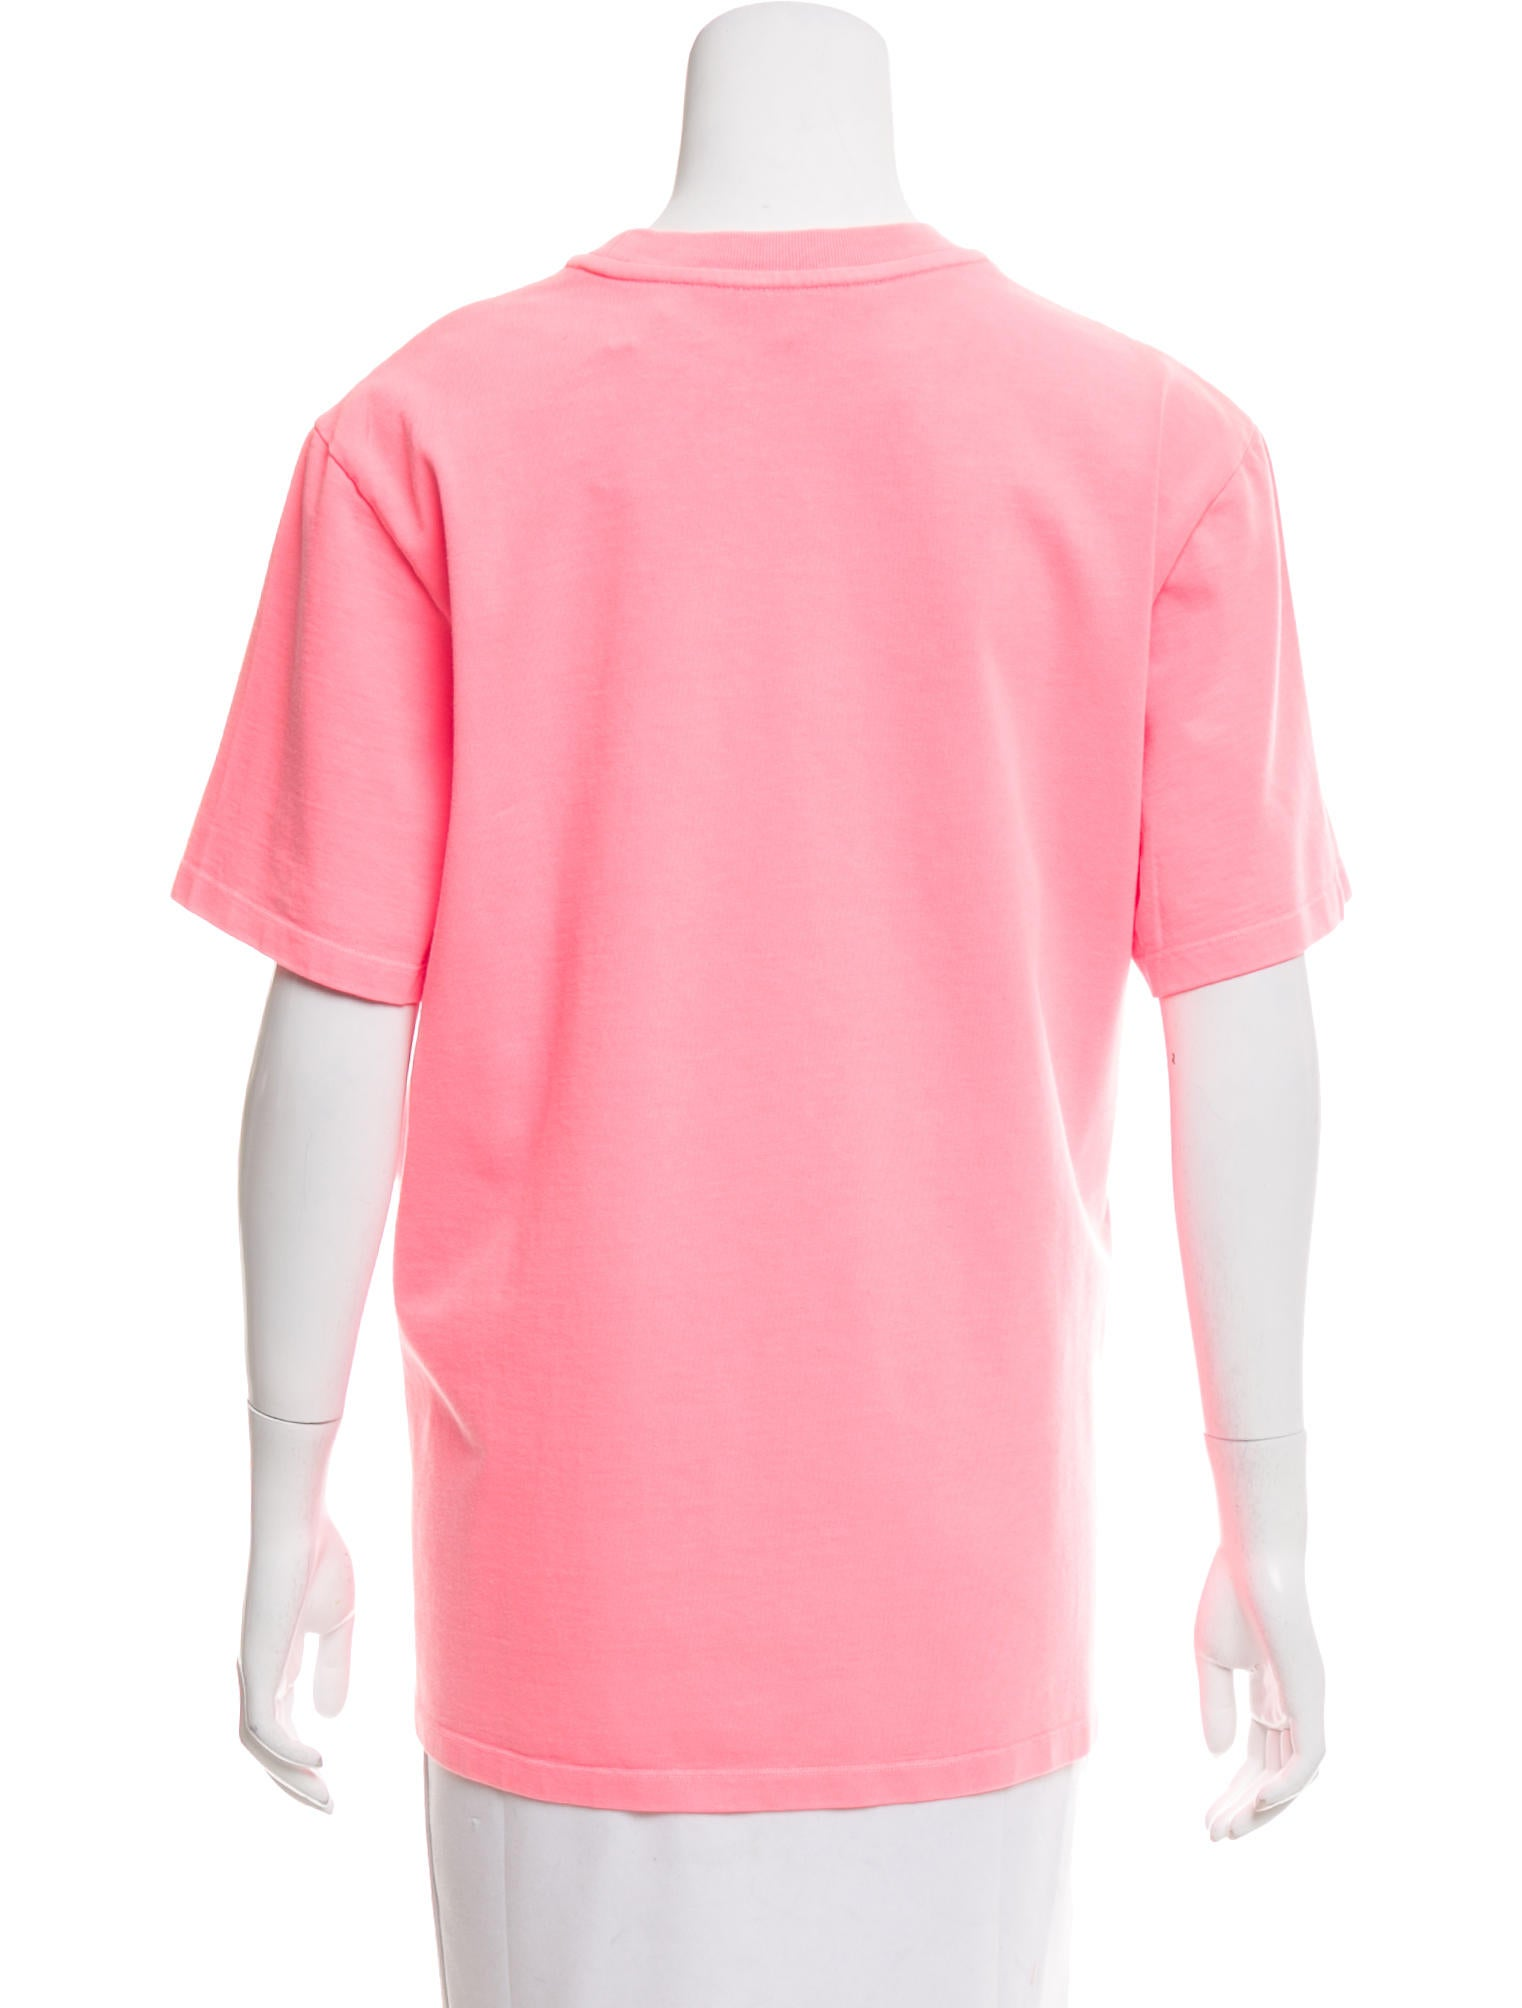 Alexander wang mild detergent oversize top clothing for Best detergent for dress shirts